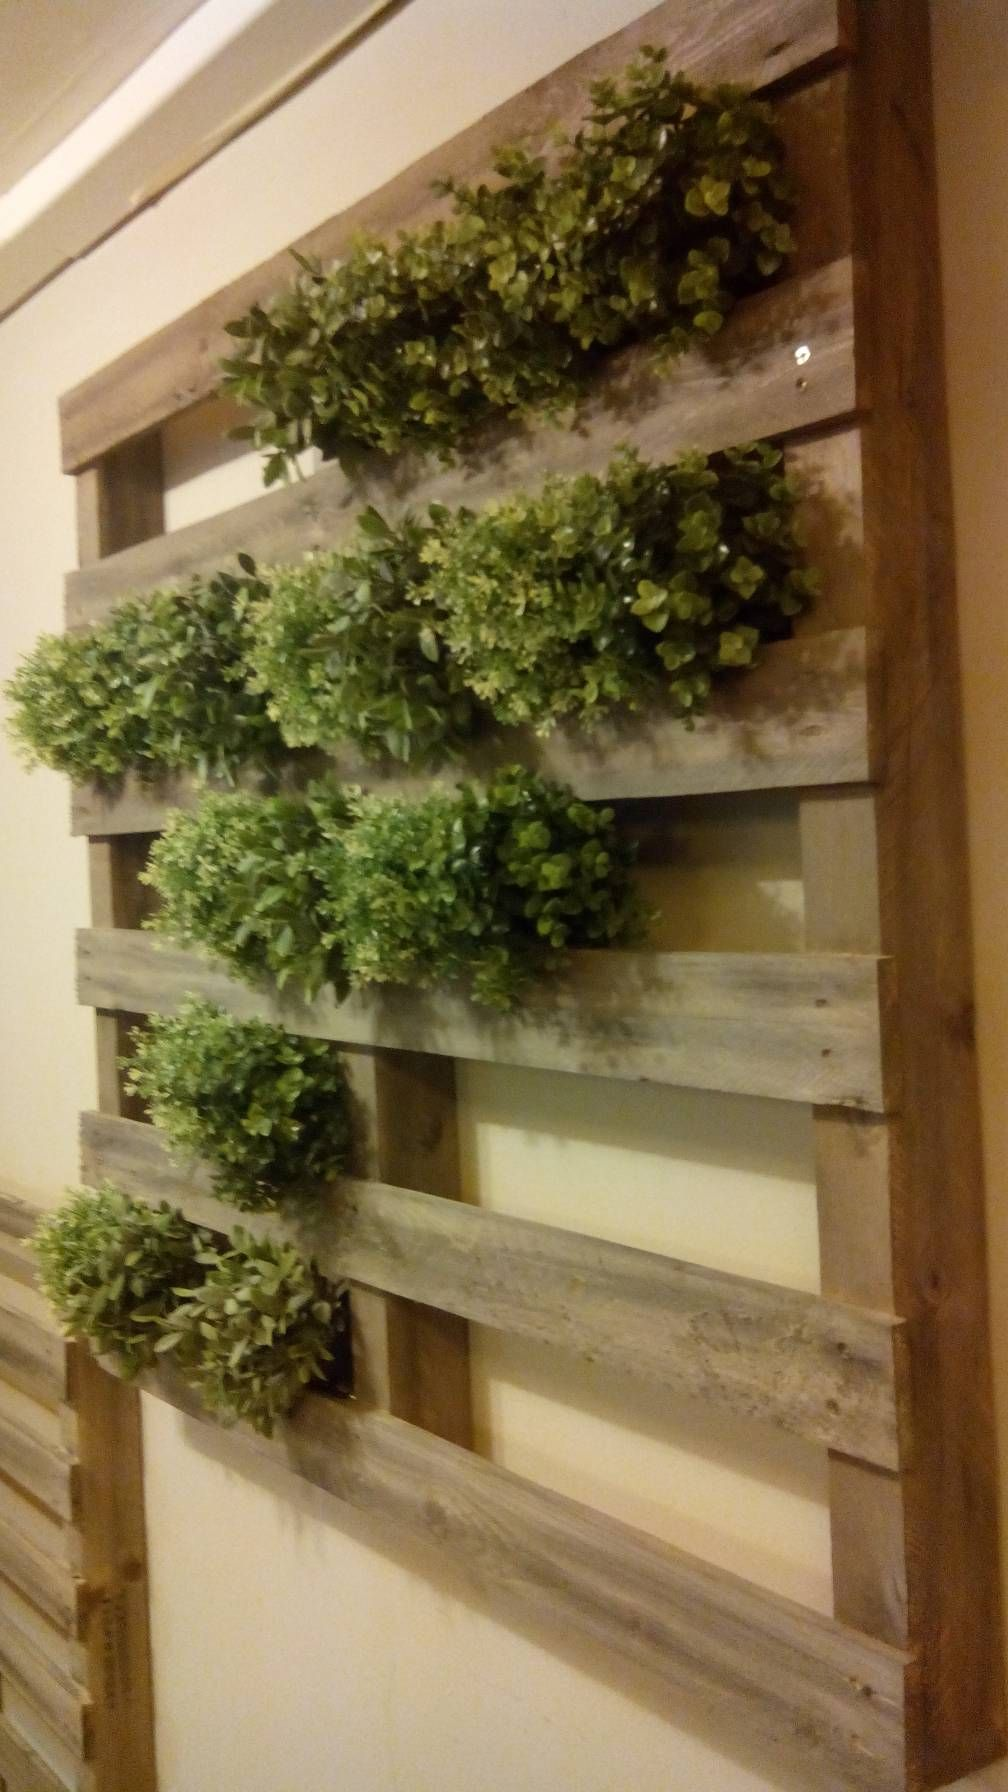 Innovative DIY Pallet Vertical Garden Ideas | Pinterest | Pallets ...